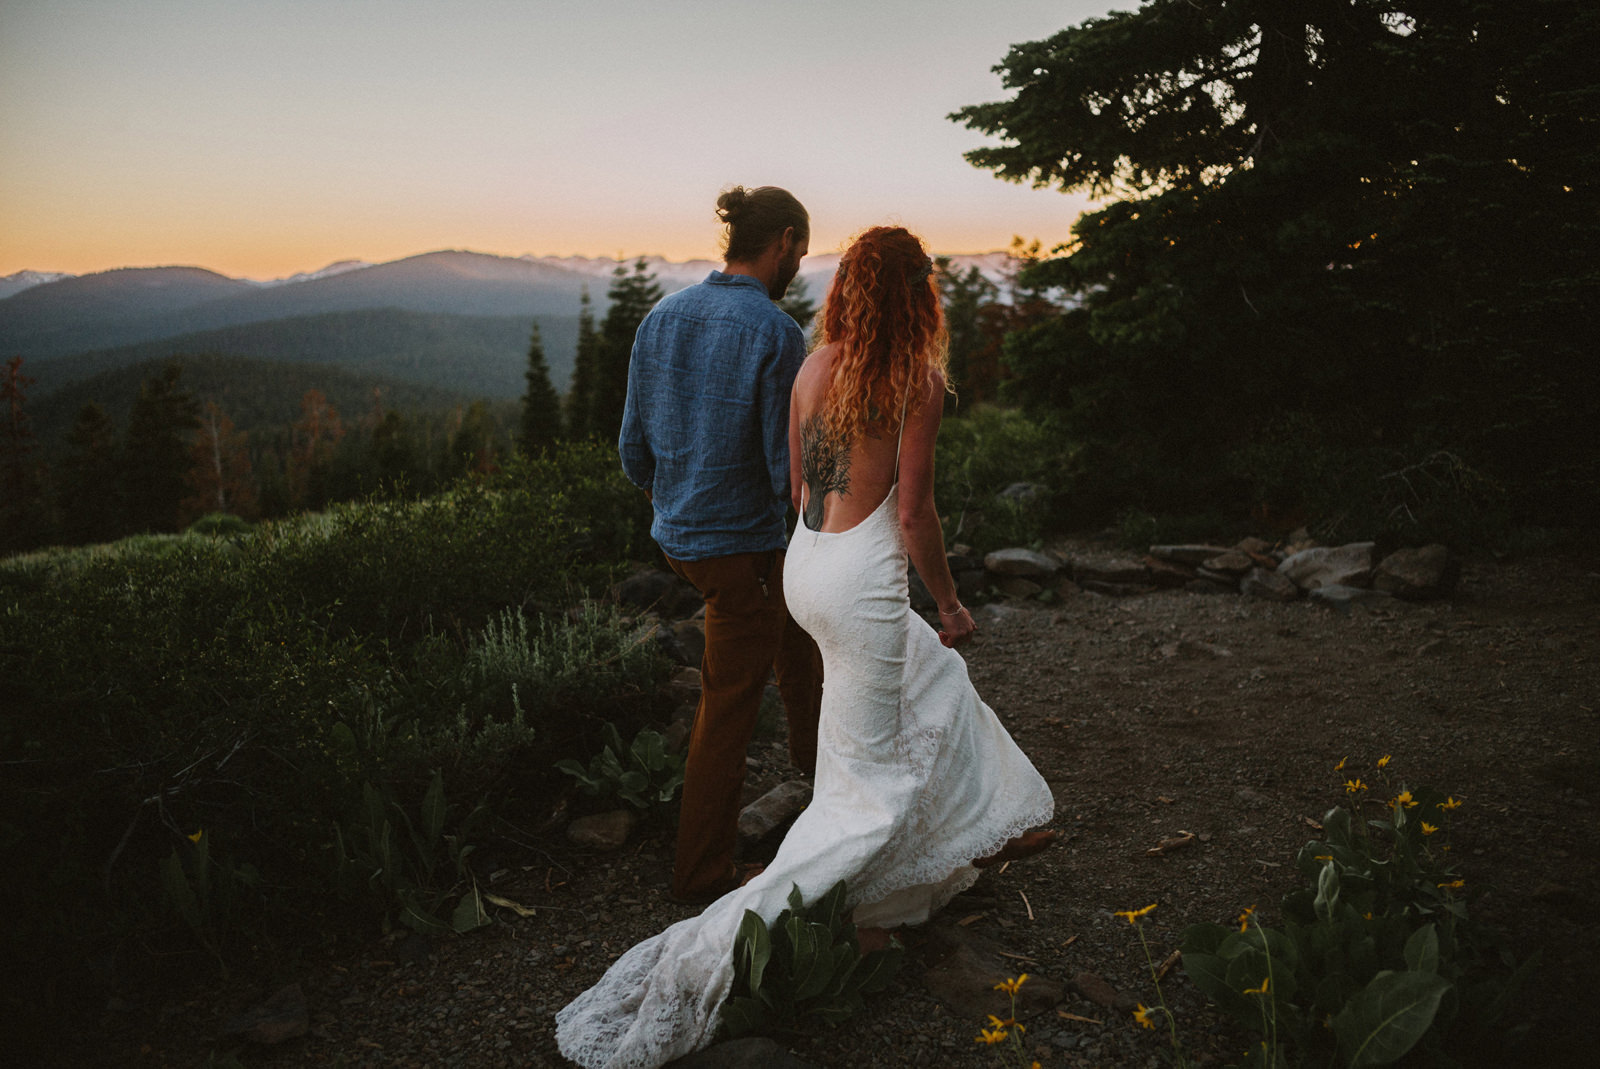 lake-tahoe-elopement-125 LAKE TAHOE ELOPEMENT